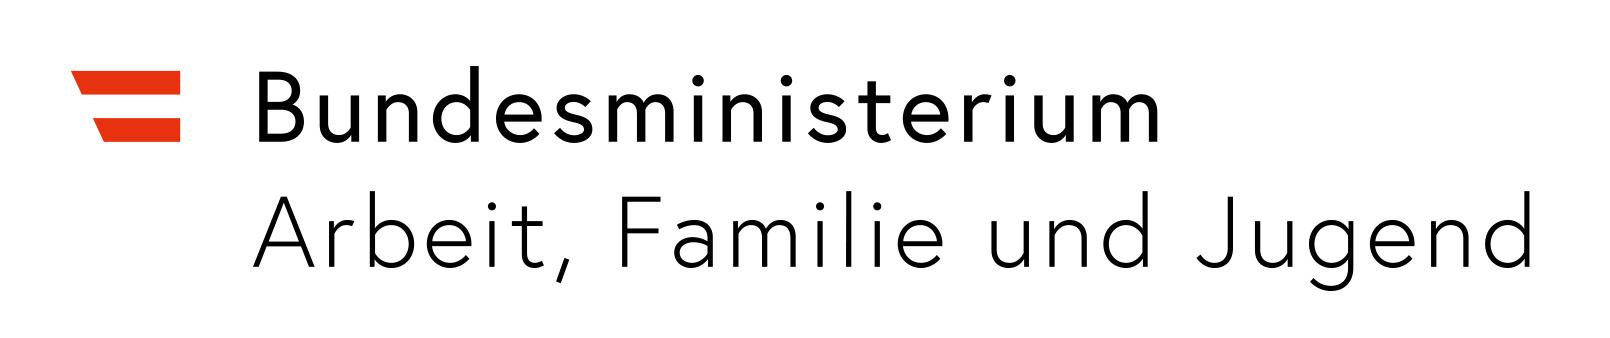 Bundesministerium Arbeit Familie Jugend